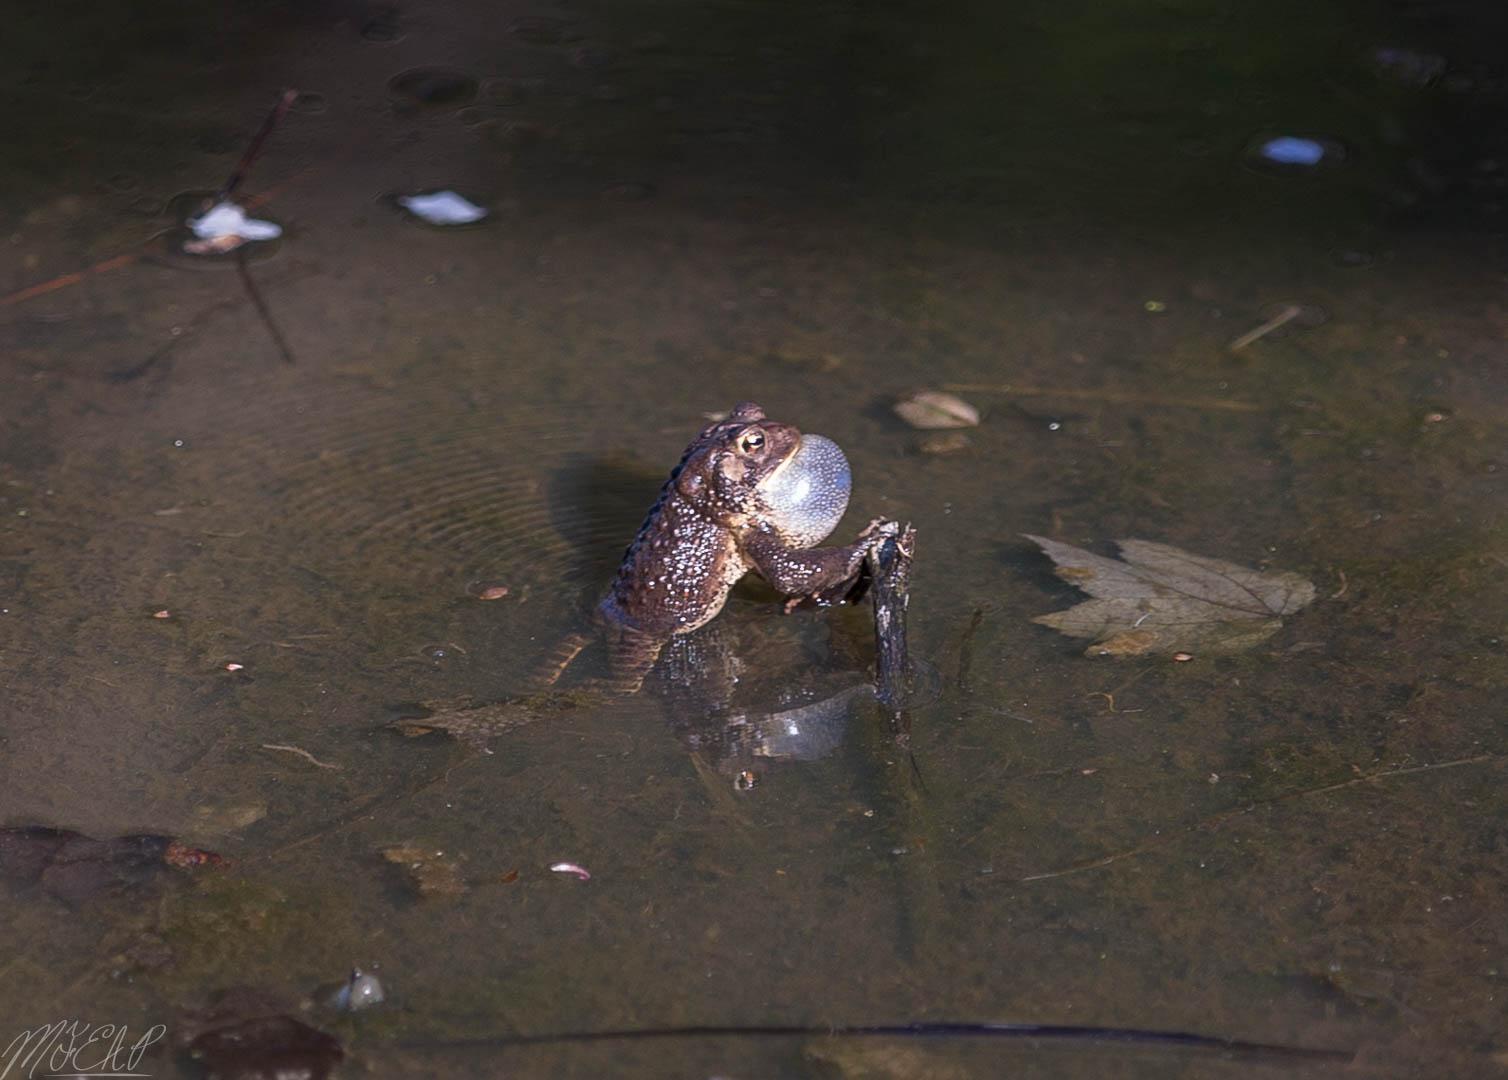 Singing toads